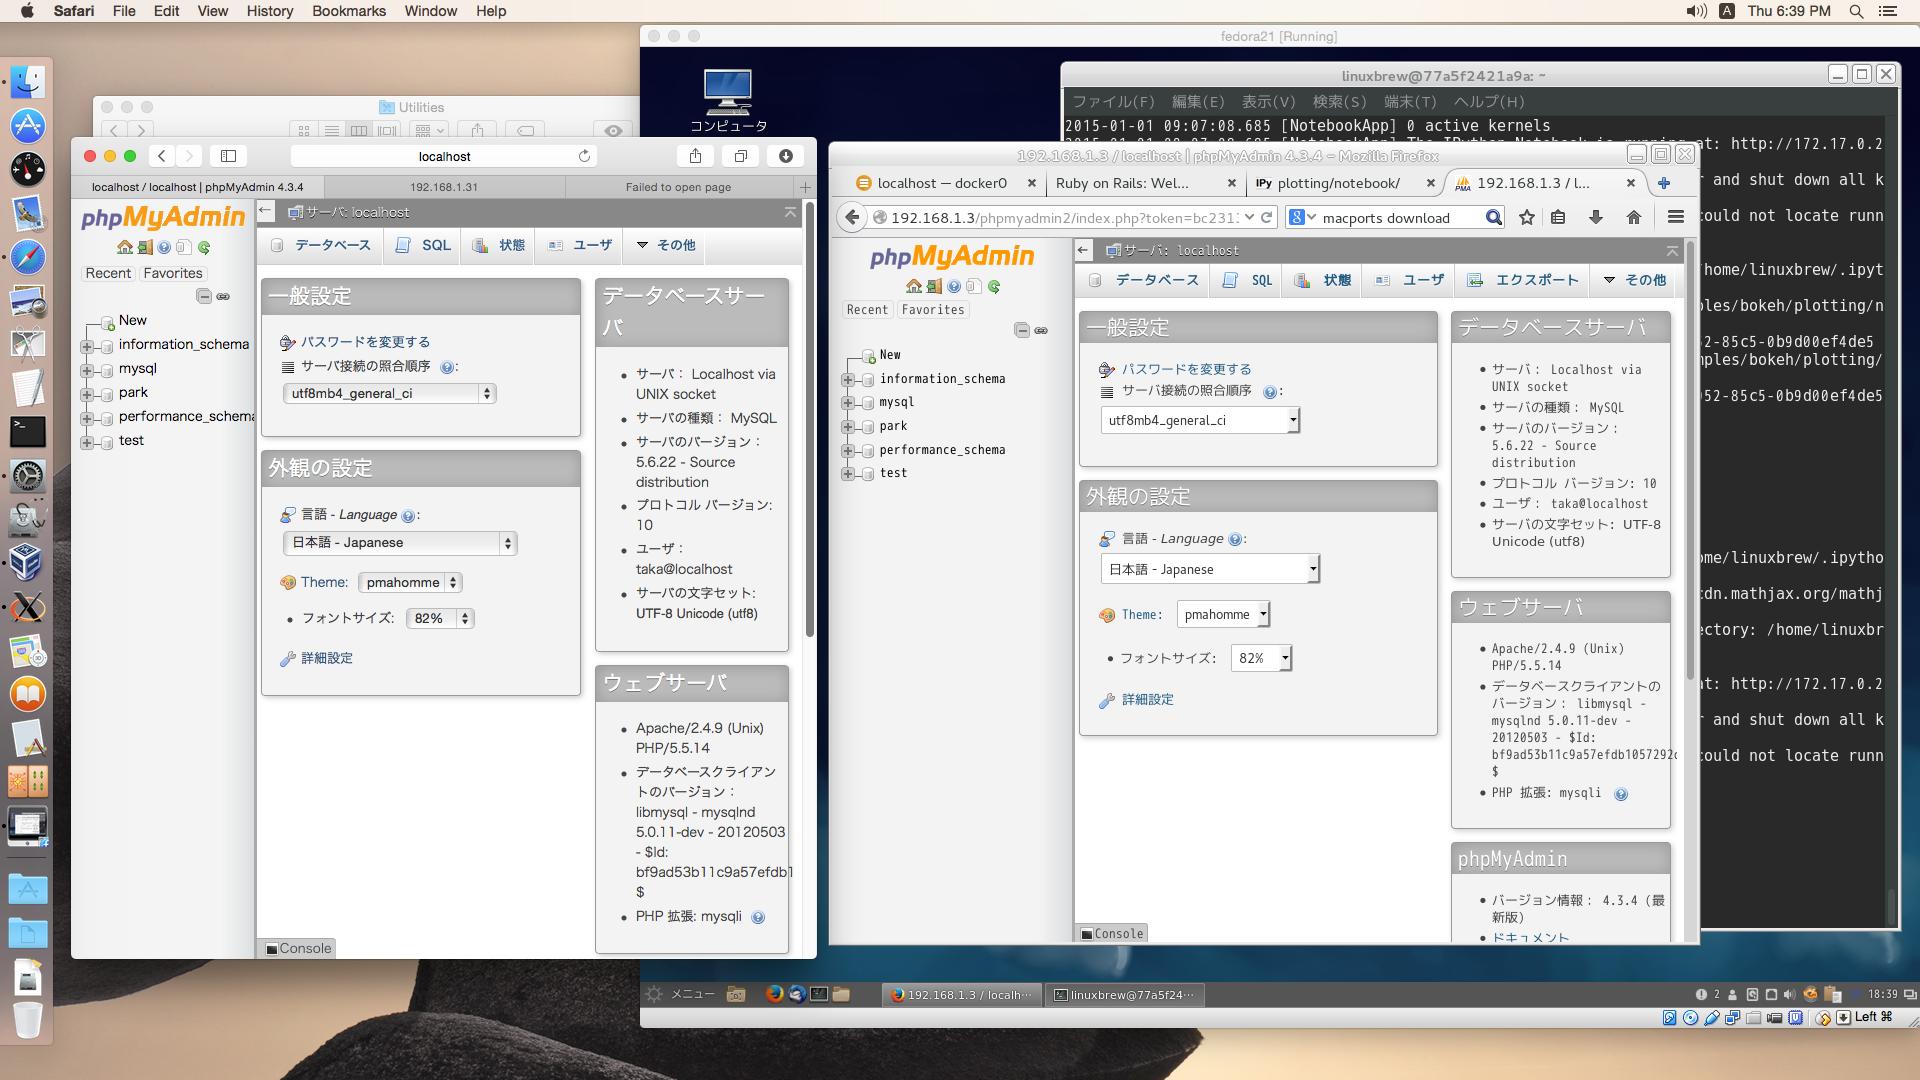 Mac+virtualbox+Fedora+cockpit+docker:unix/linuxあれこれ:So